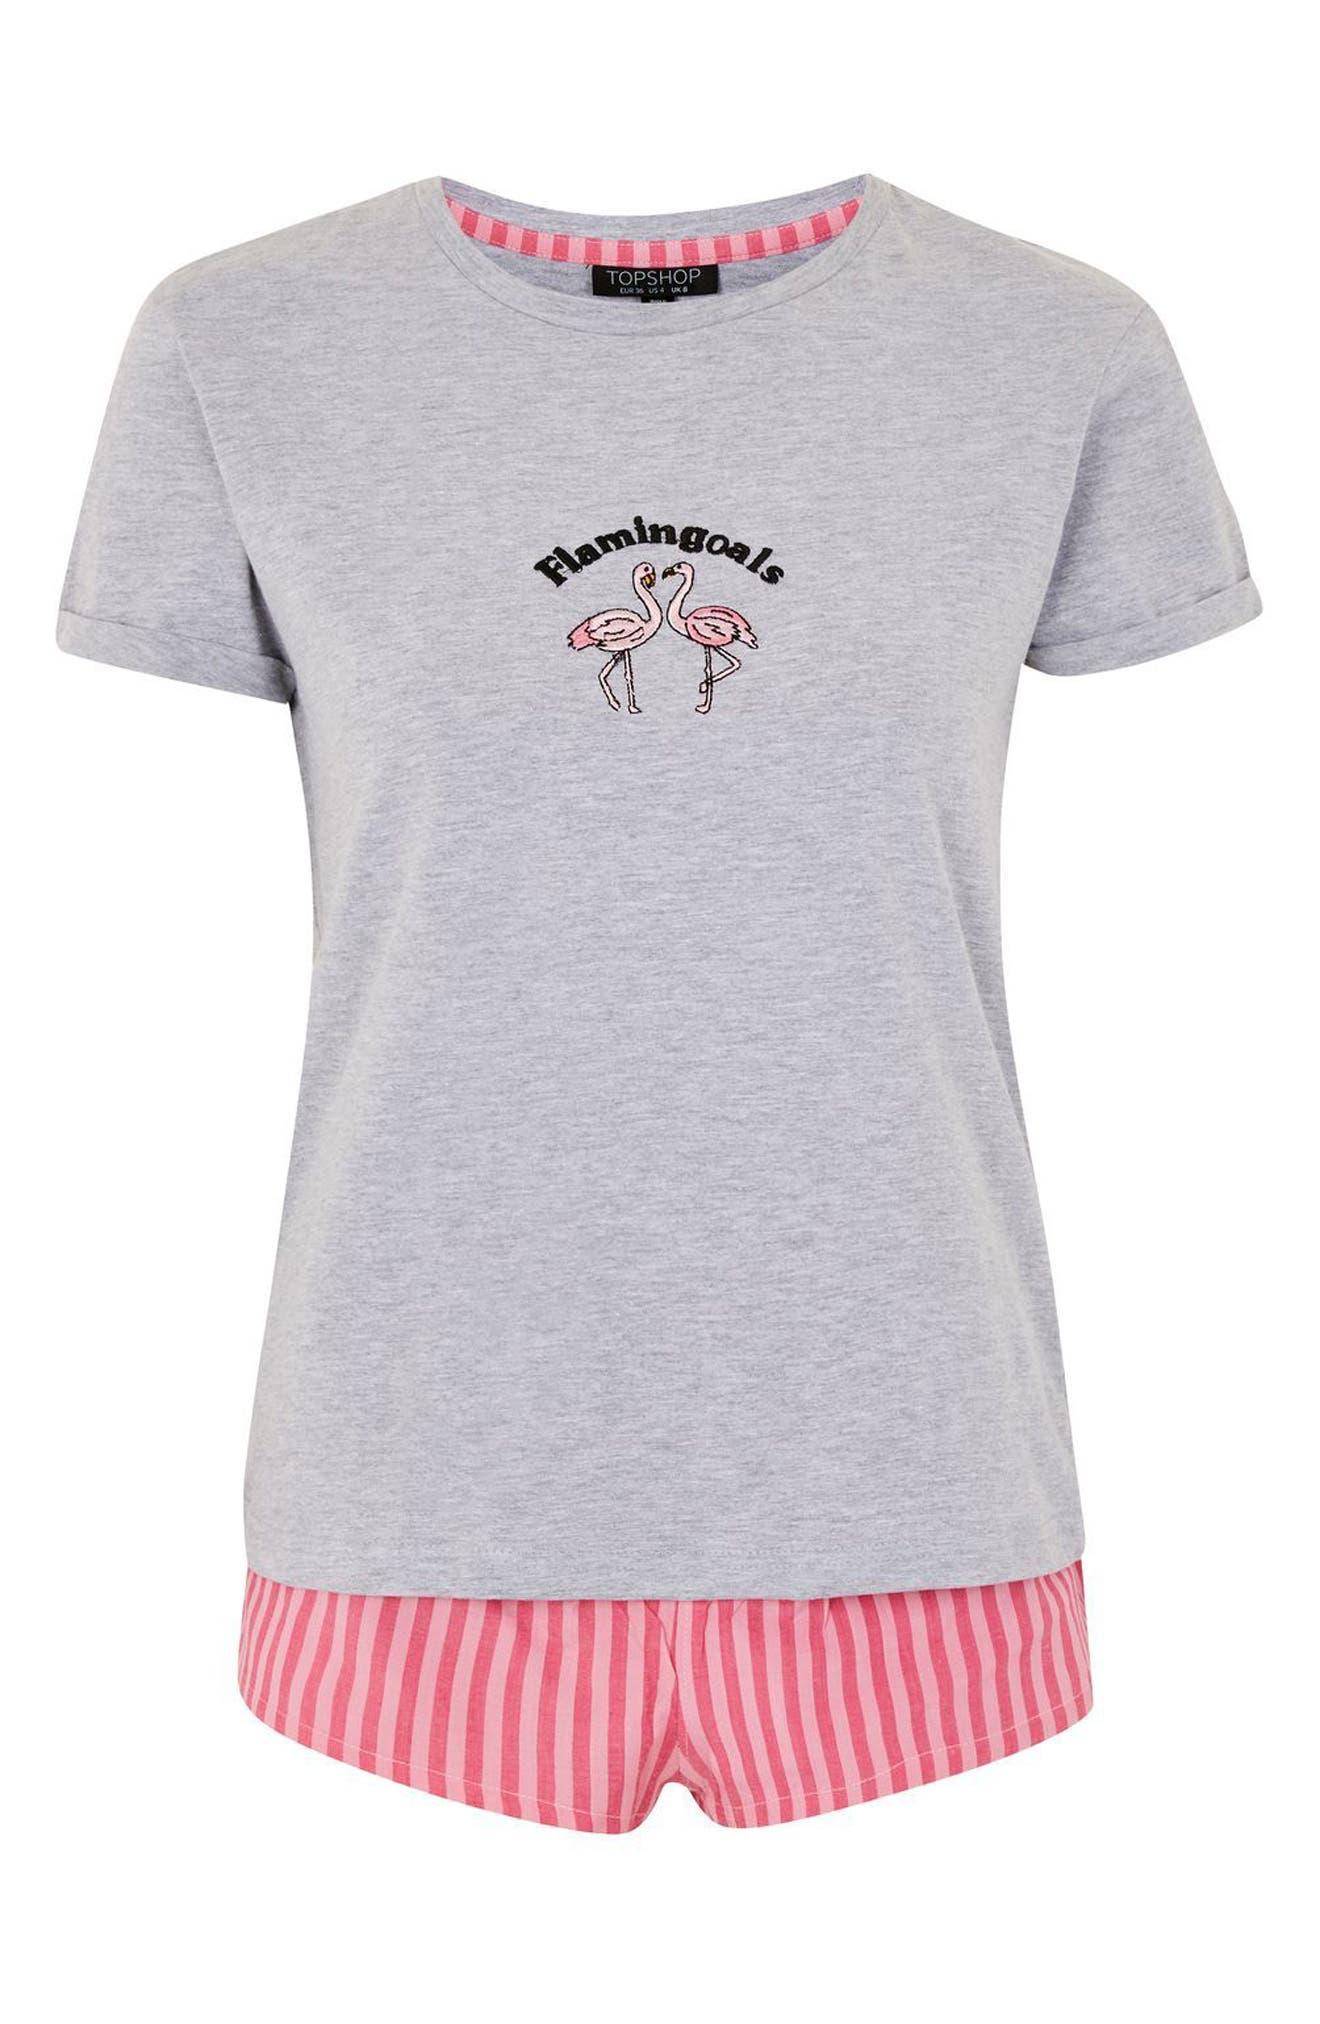 Flamingoals Short Pajamas,                             Alternate thumbnail 3, color,                             Pink Multi